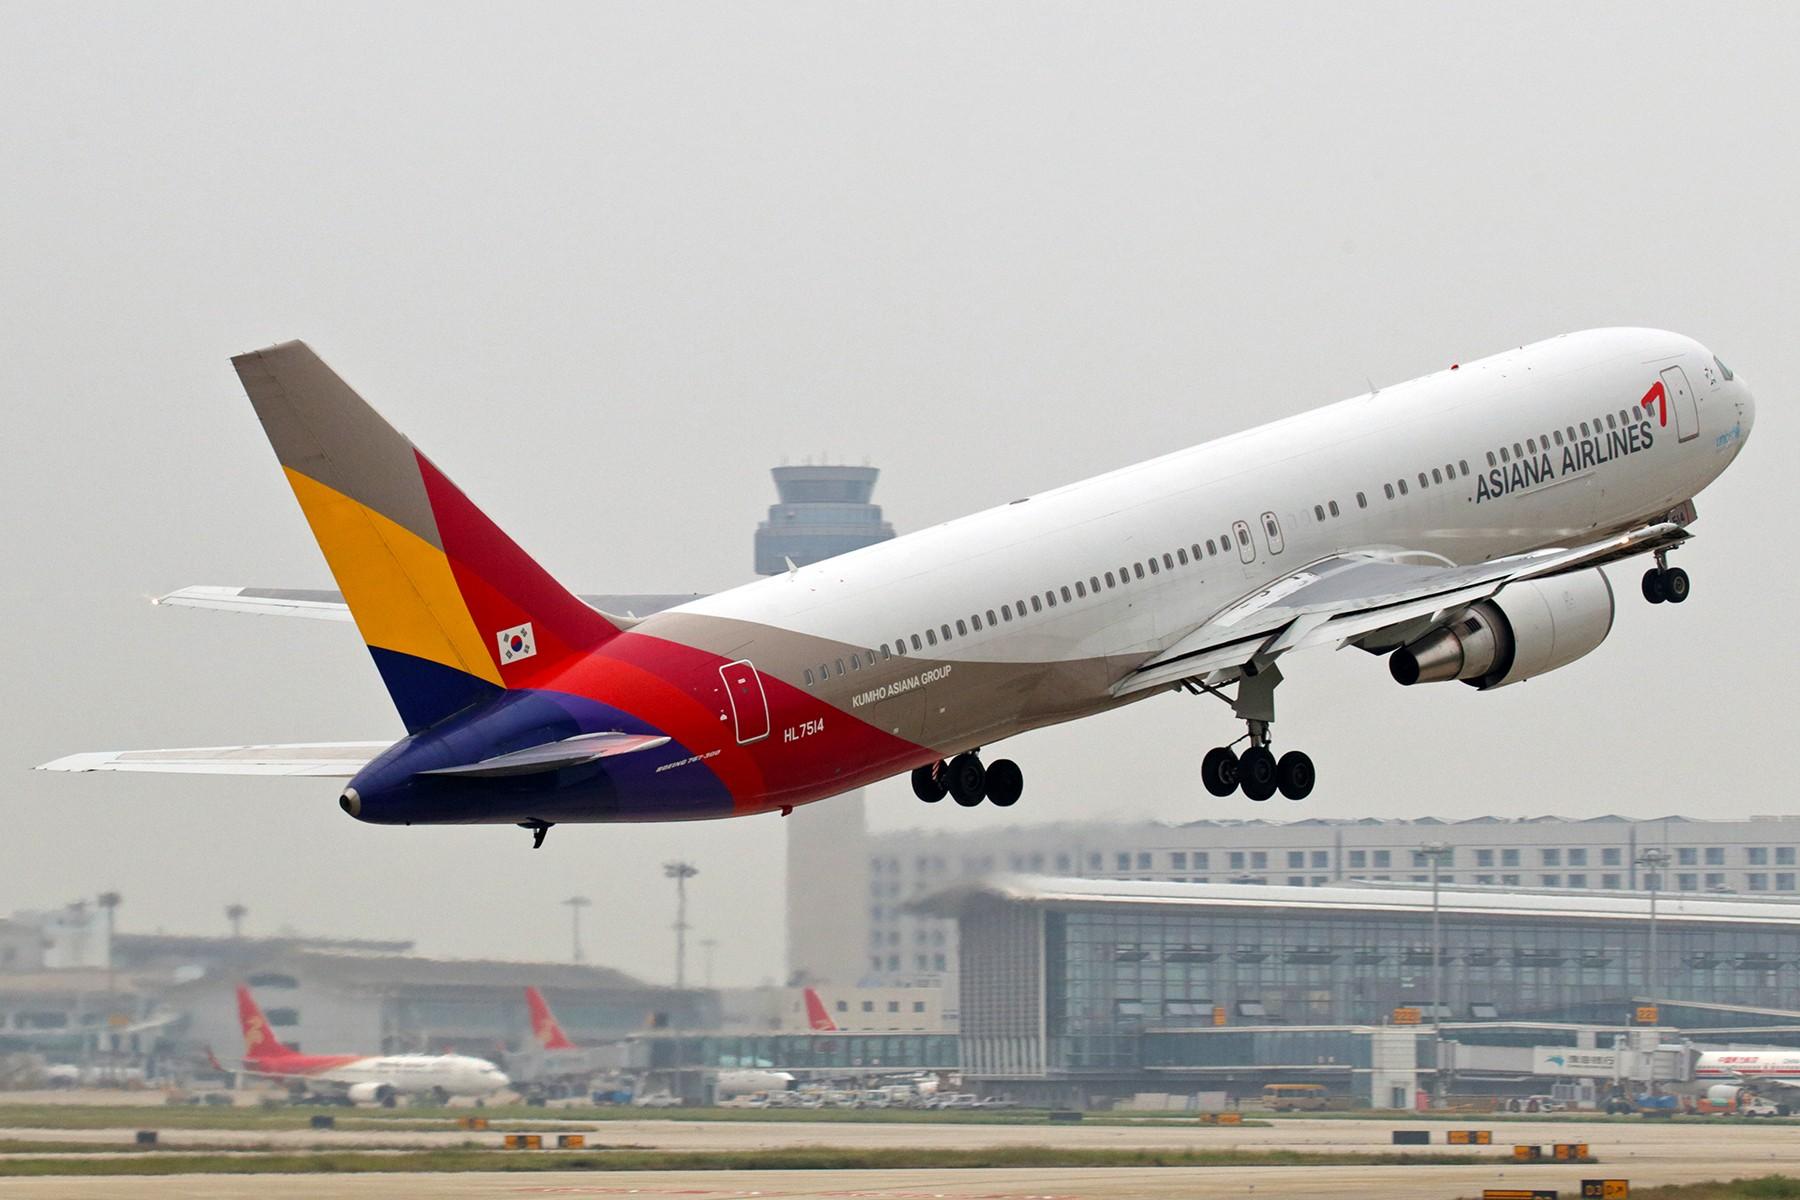 Re:[原创]【BLDDQ】******NKG07/25单跑道运行中----先贴波音标准加长款****** BOEING 767-300ER HL7514 中国南京禄口国际机场